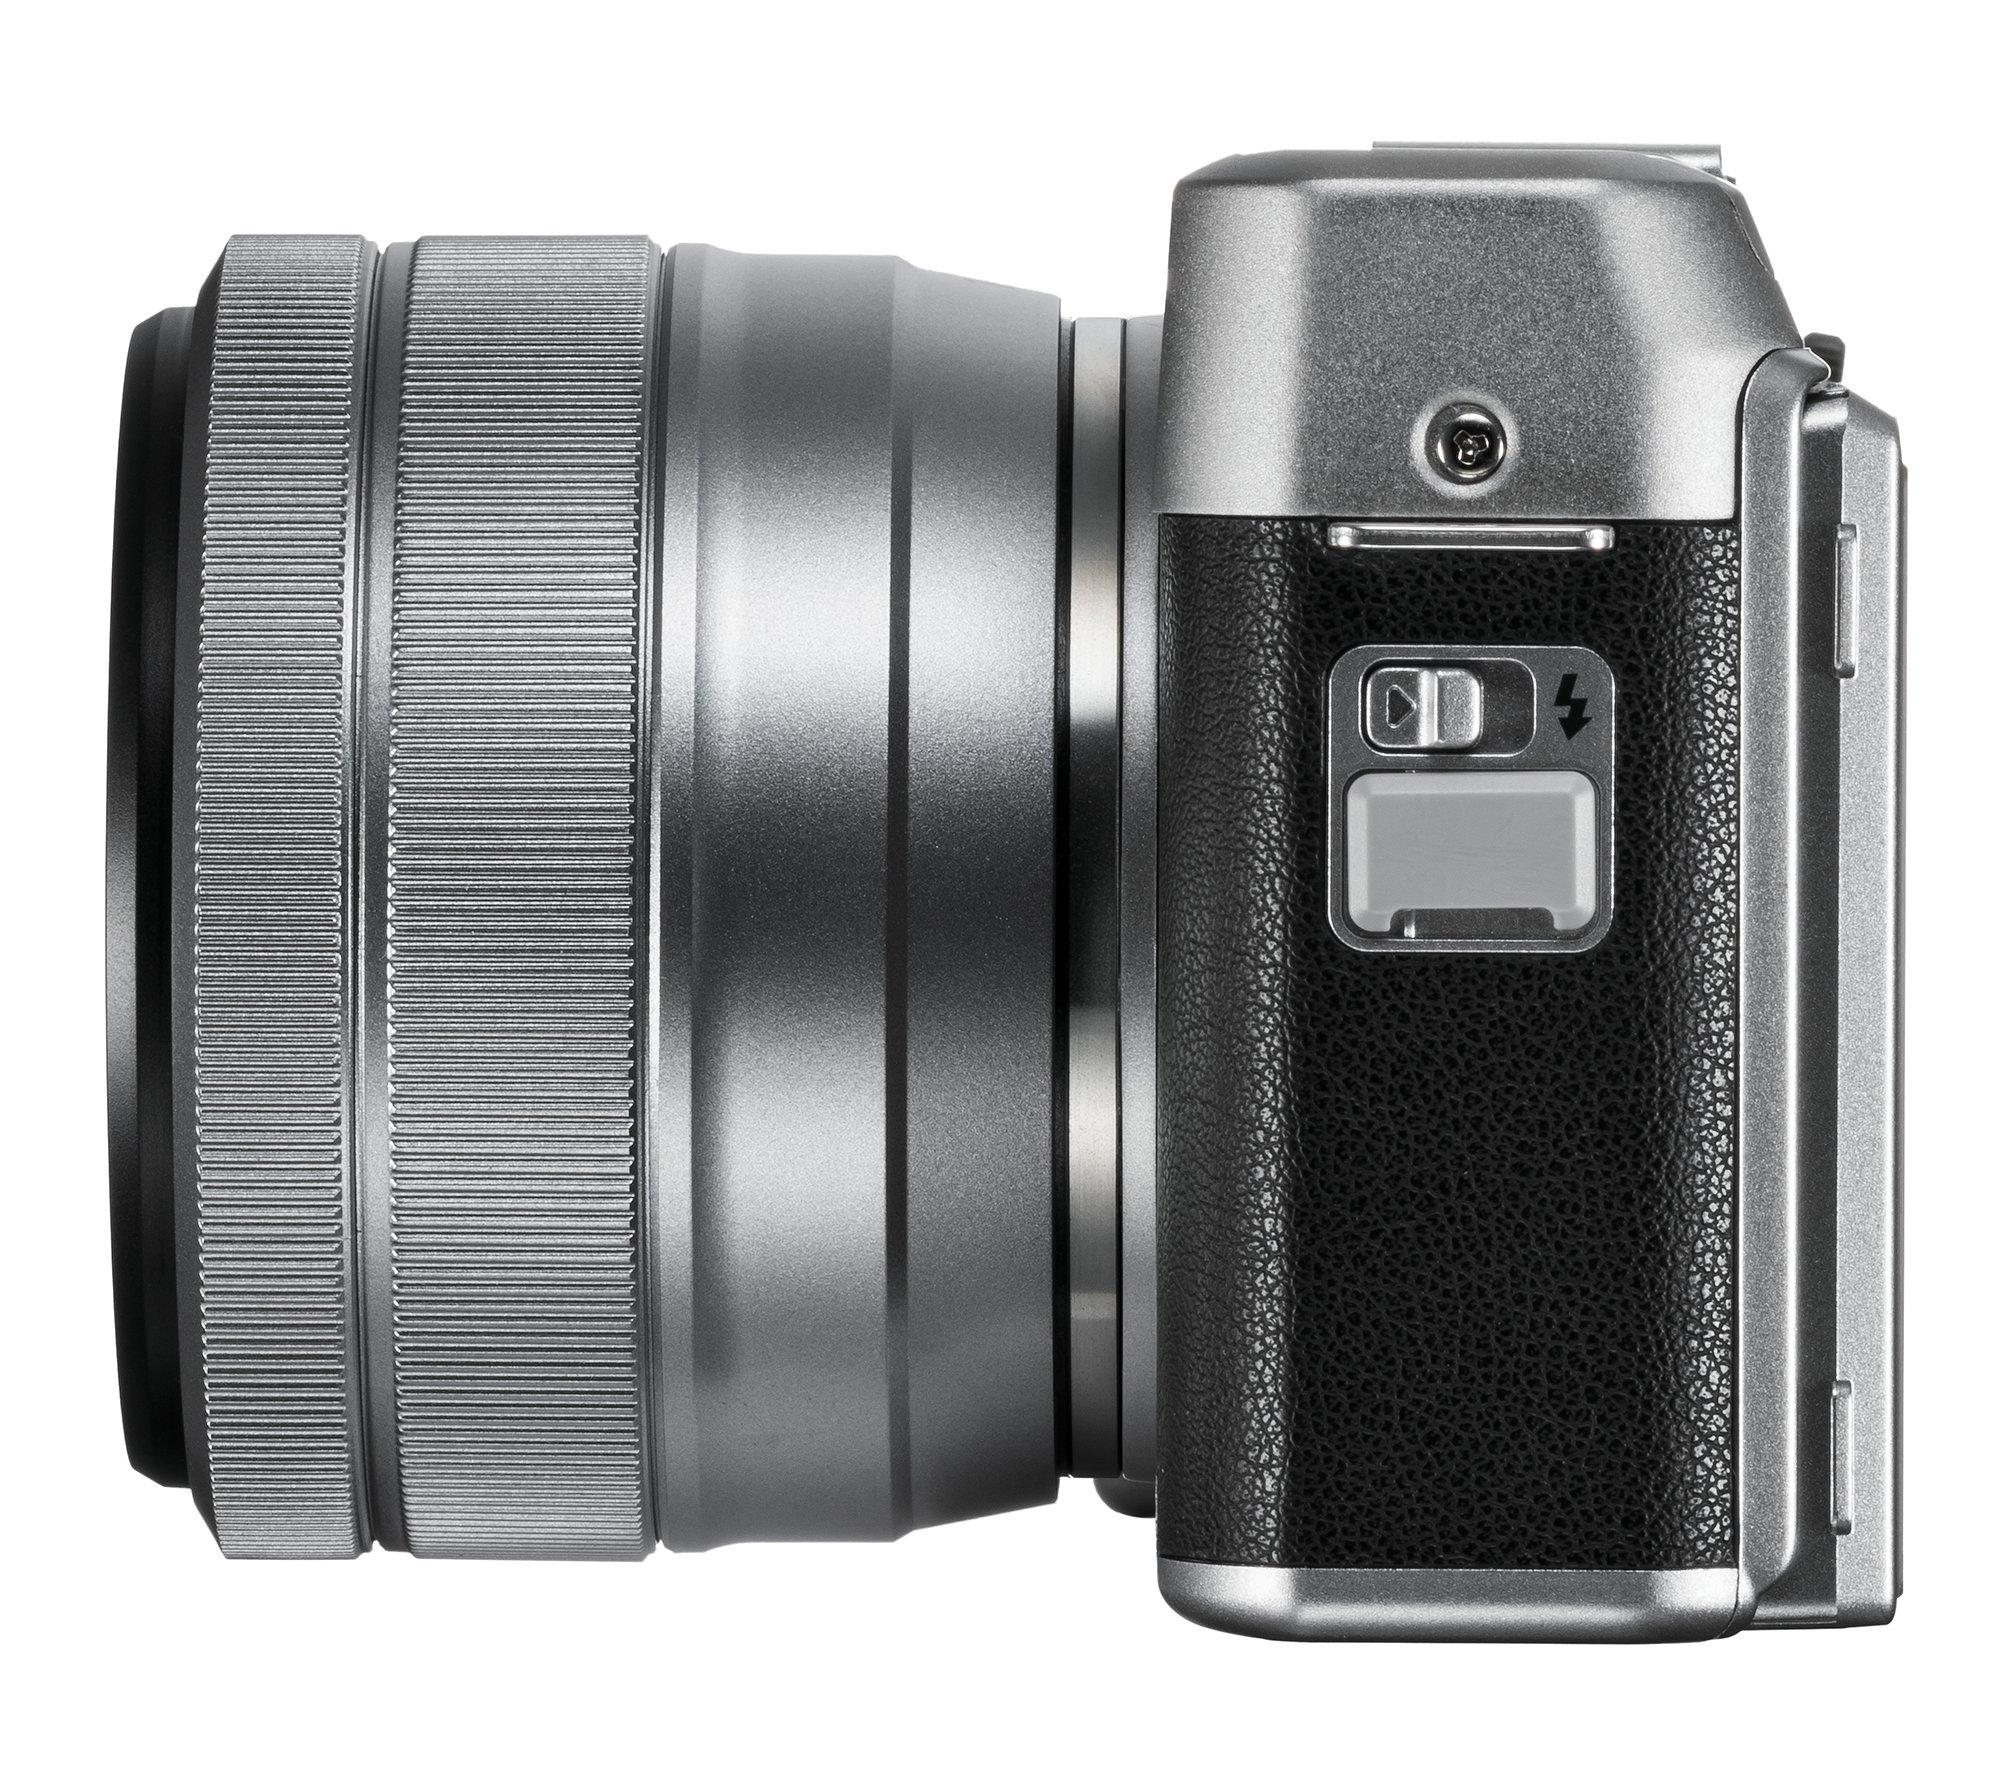 Fujifilm X-A5 Mirrorless Digital Camera w/XC15-45mmF3.5-5.6 OIS PZ Lens - Silver by Fujifilm (Image #8)